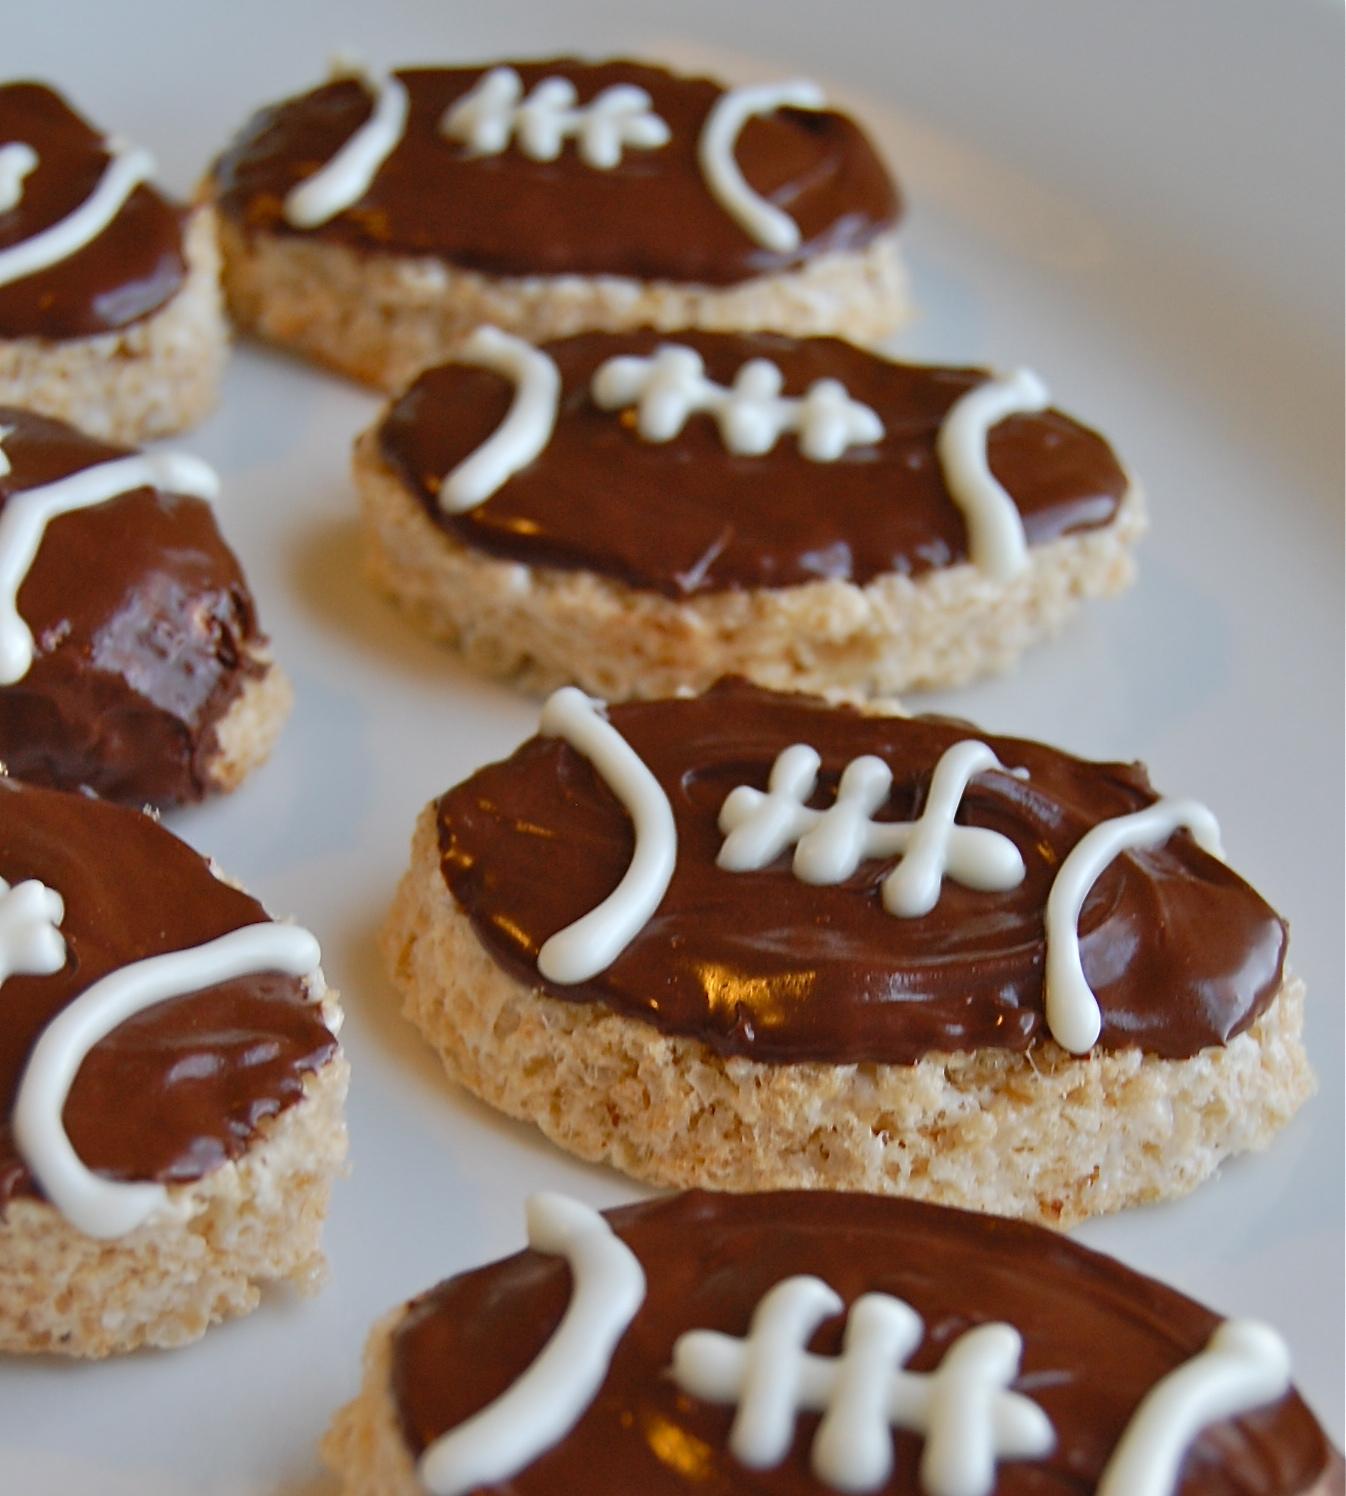 Football Treats and Snacks - Hoosier Homemade |Super Bowl Goodies